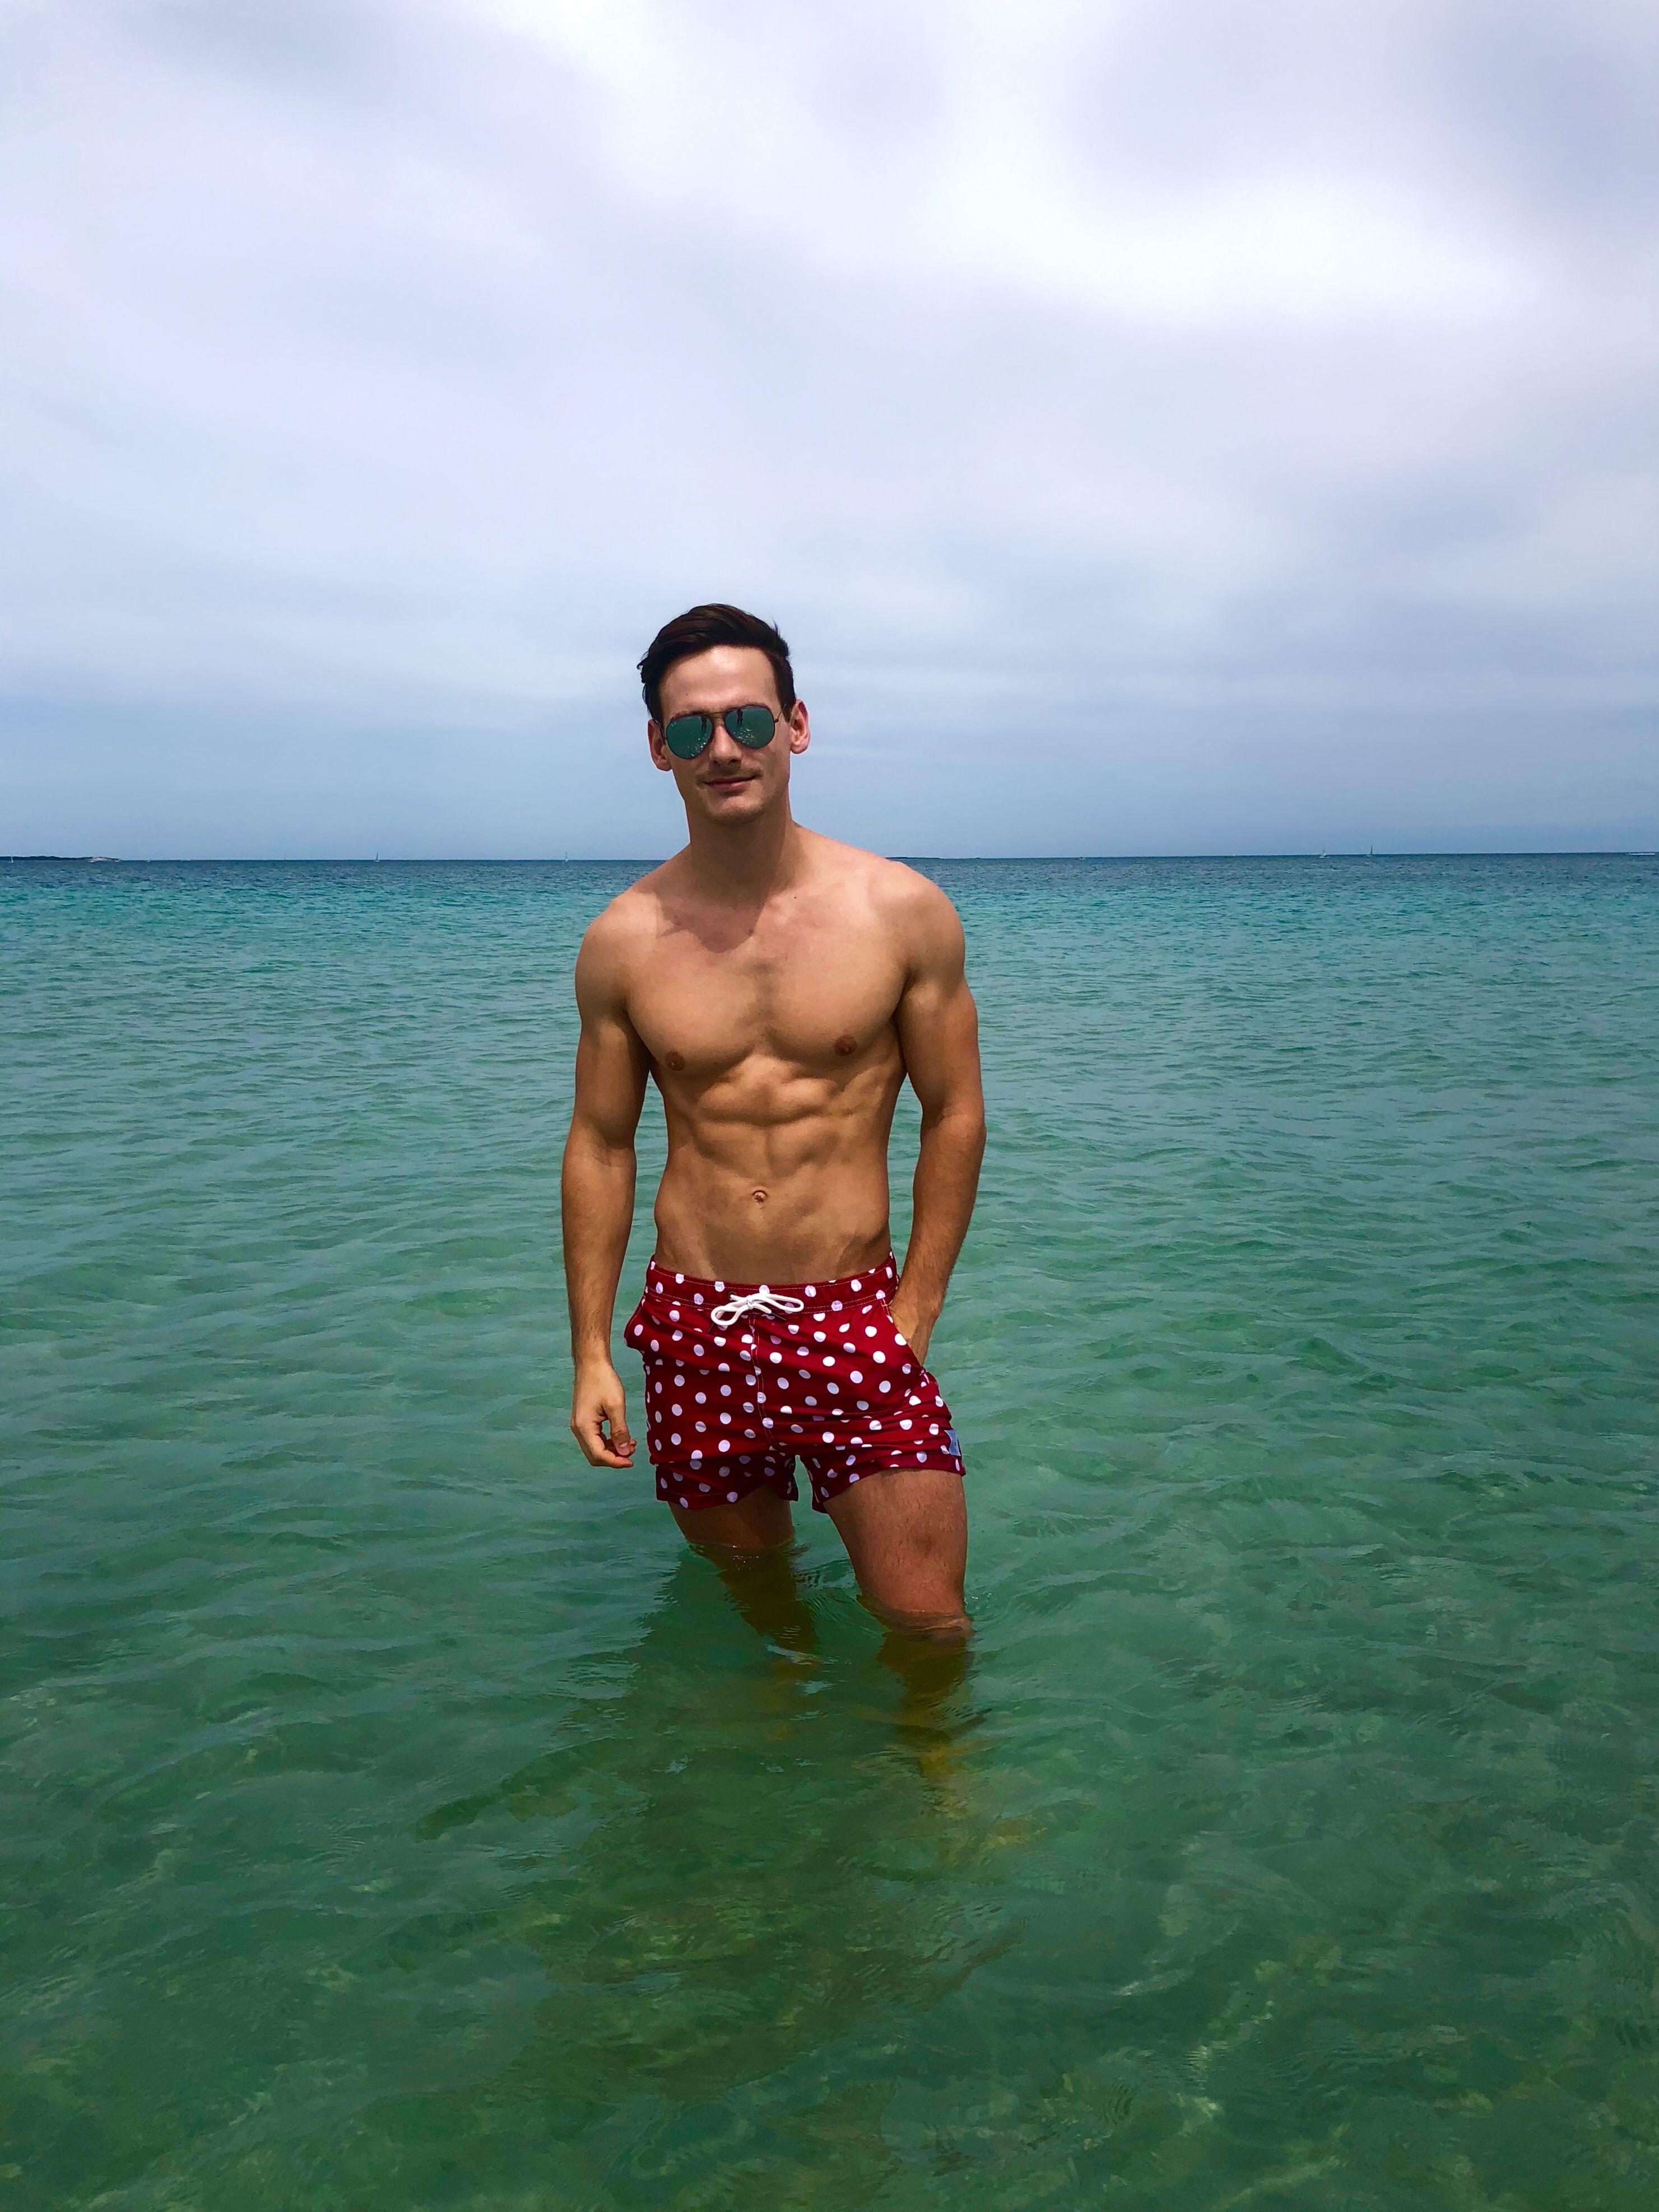 f9f4efe8a1 Vacation Style, Nalu, Swim Trunks, Beachwear, Beach Playsuit, Outfit Beach,